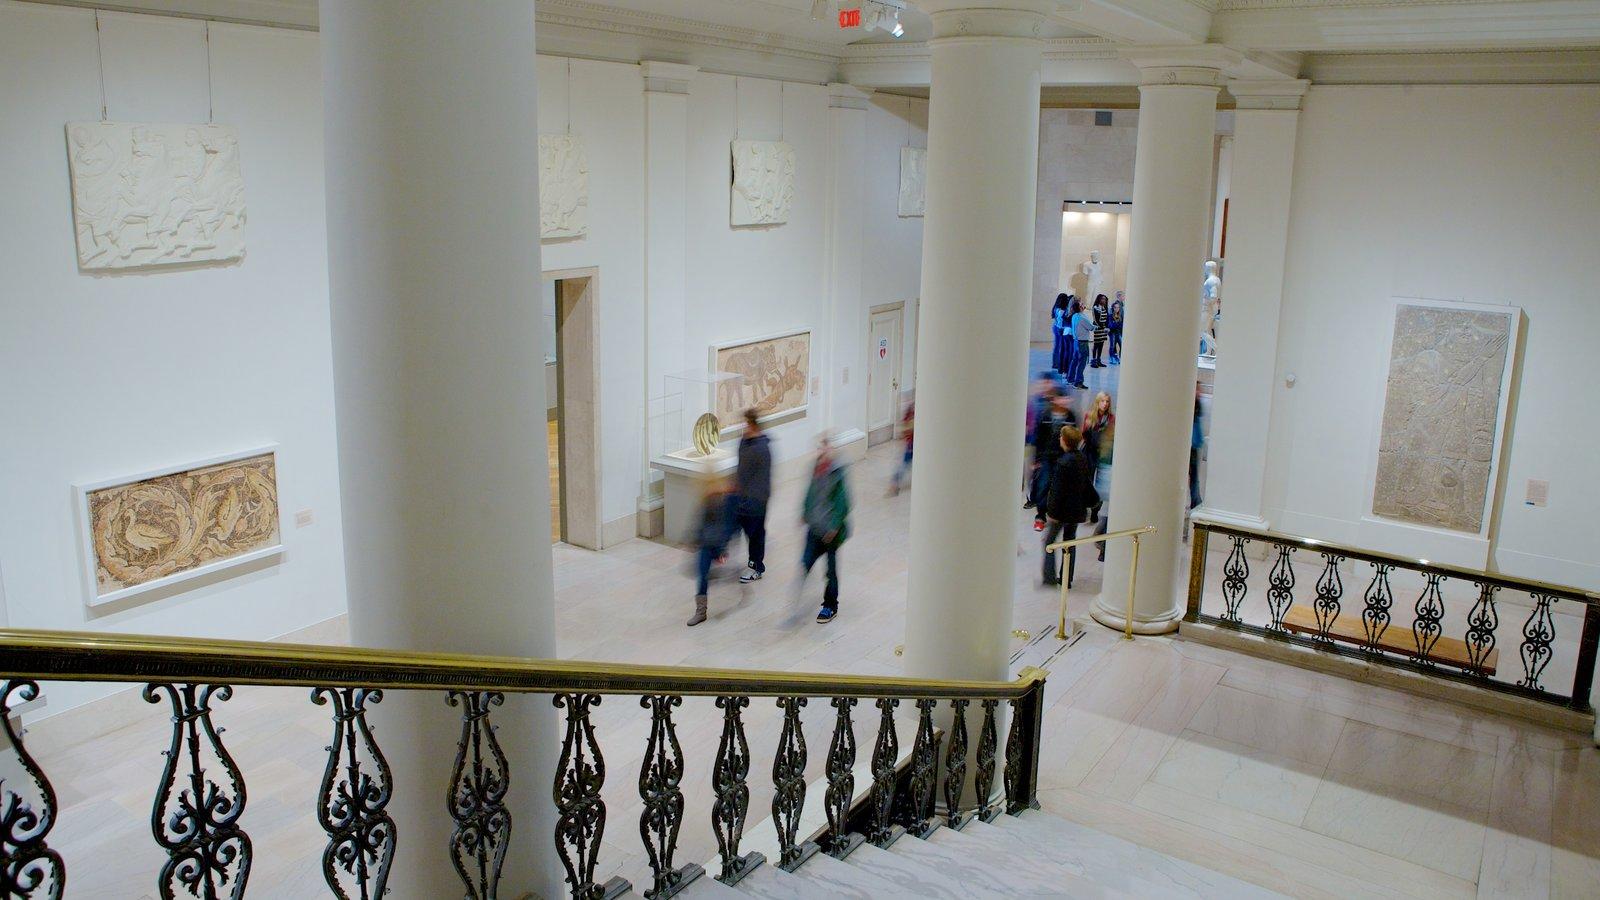 Minneapolis Institute of Arts mostrando vistas internas e arte